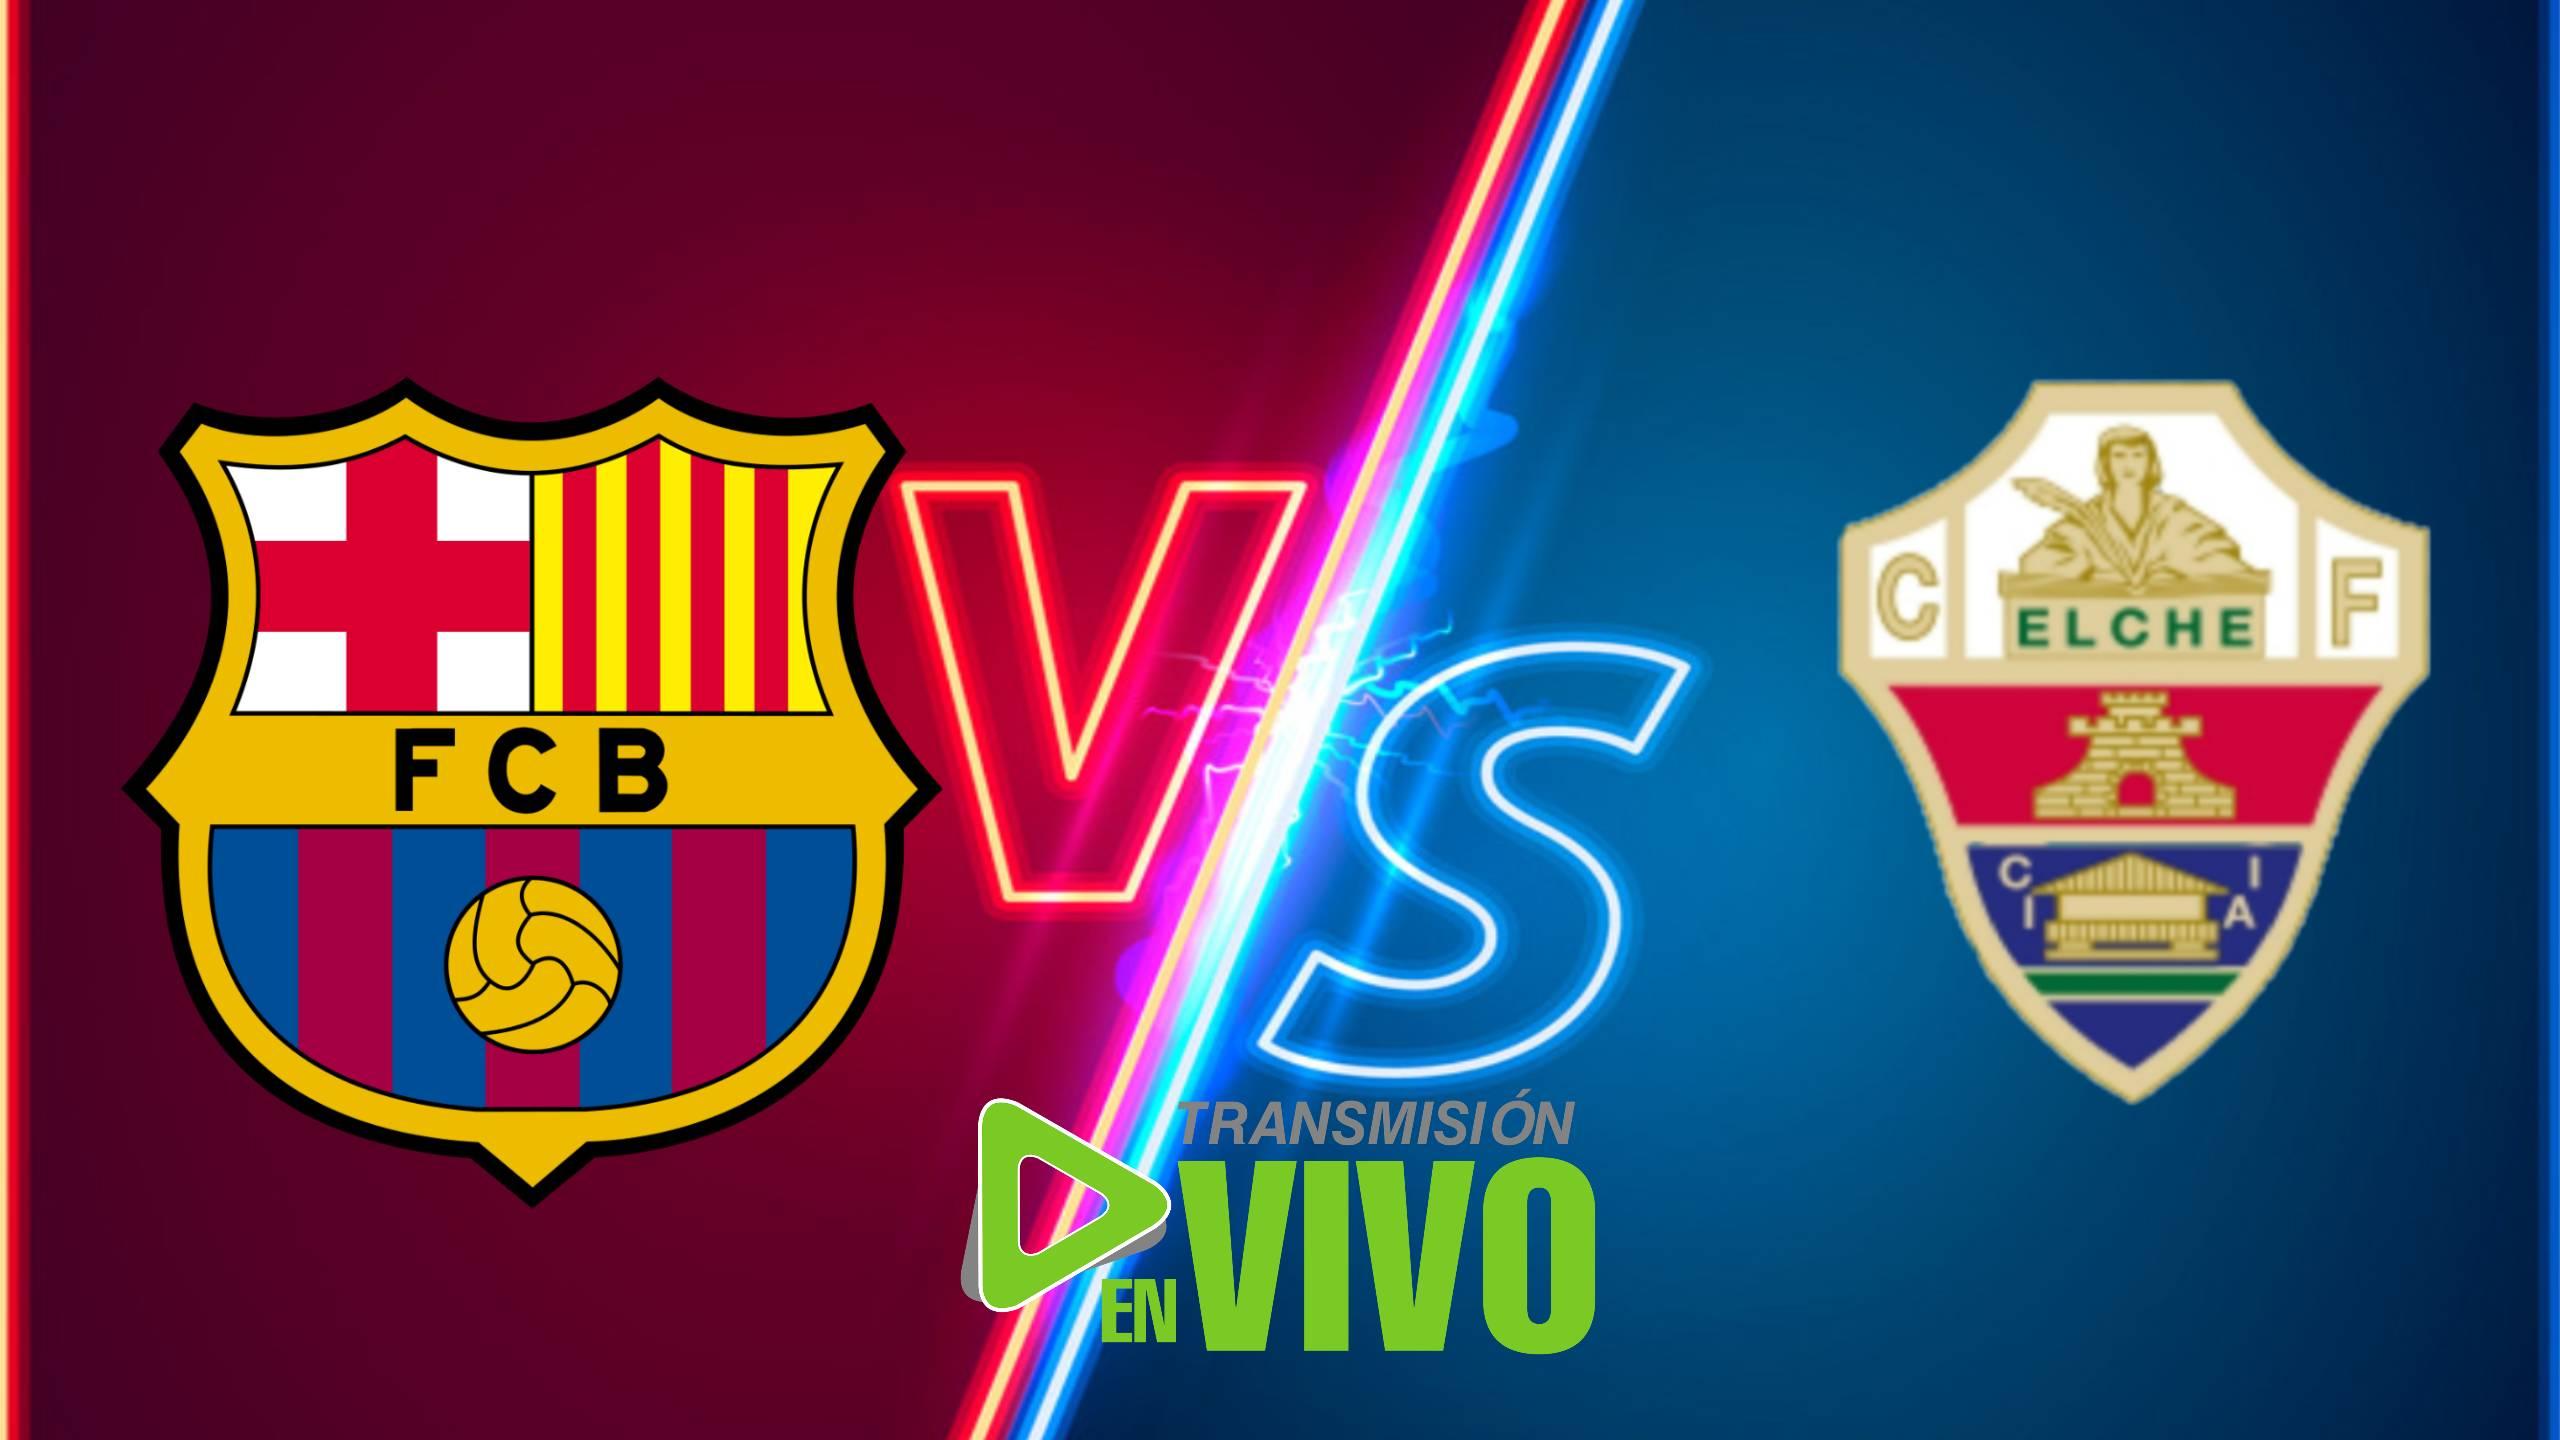 Transmisión en vivo Barcelona vs Elche